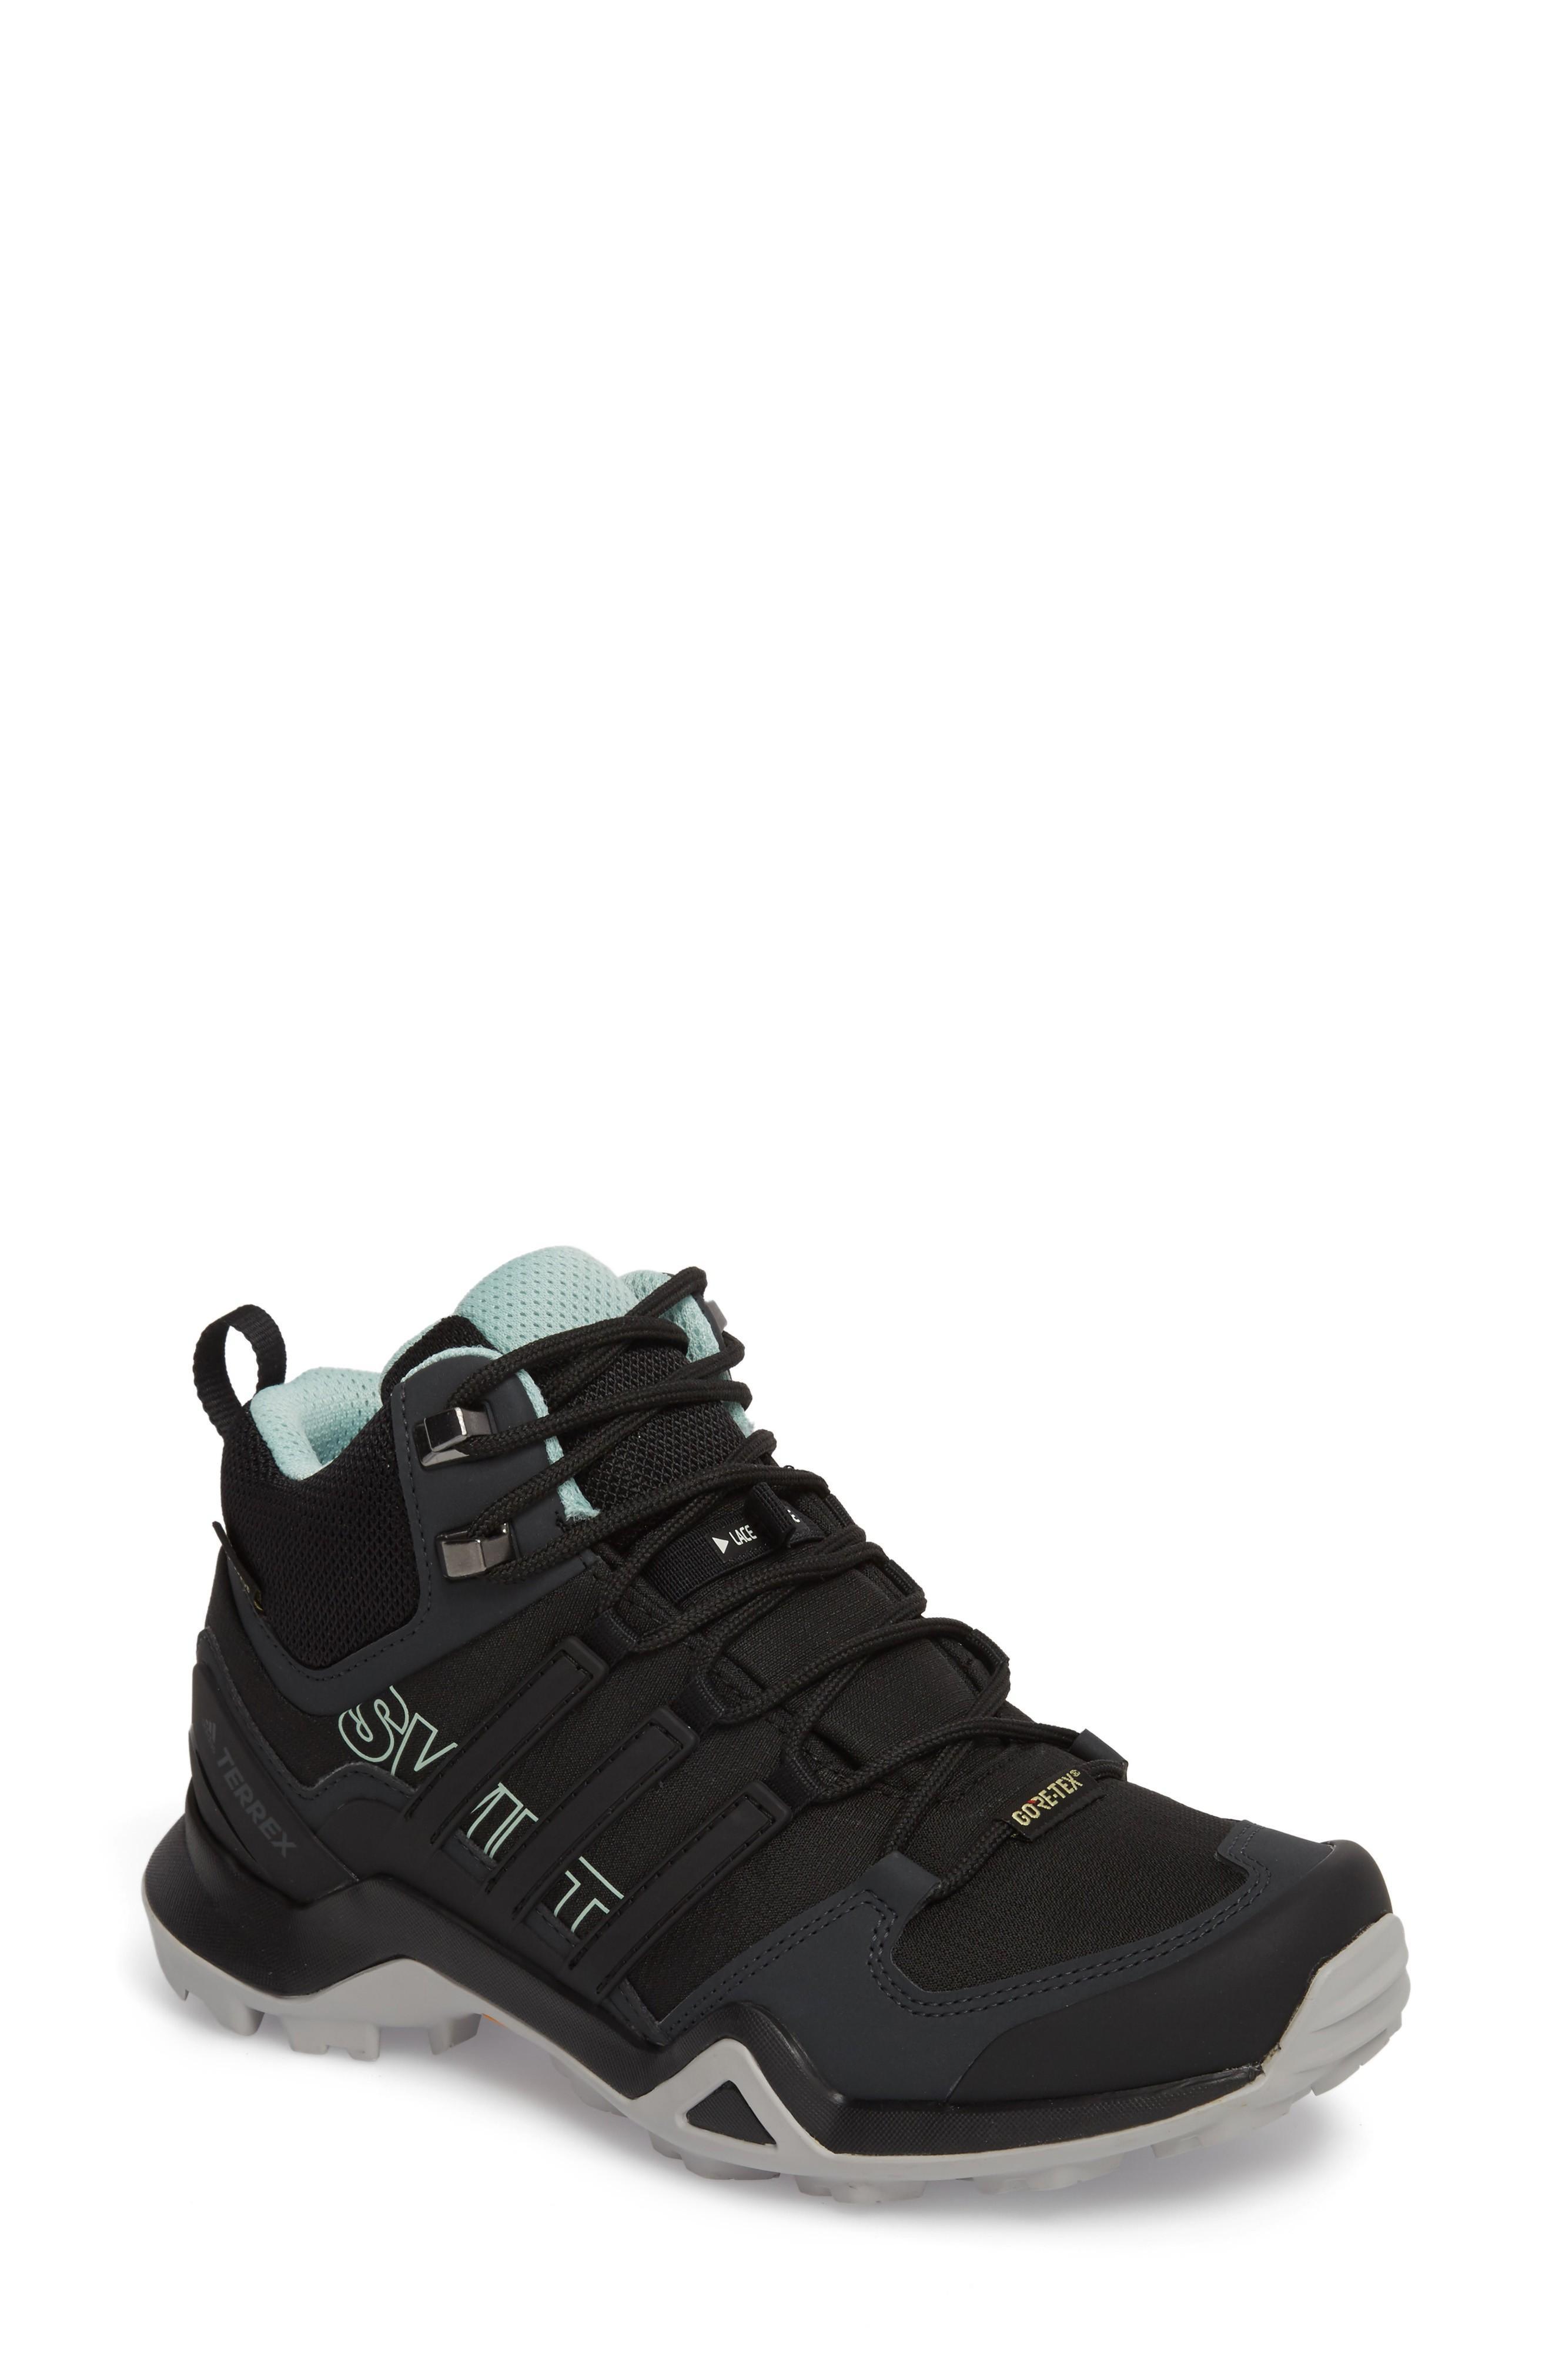 Adidas Originals Terrex Swift R2 Mid Gore-tex Hiking Boot In Black/ Black/ Ash Green